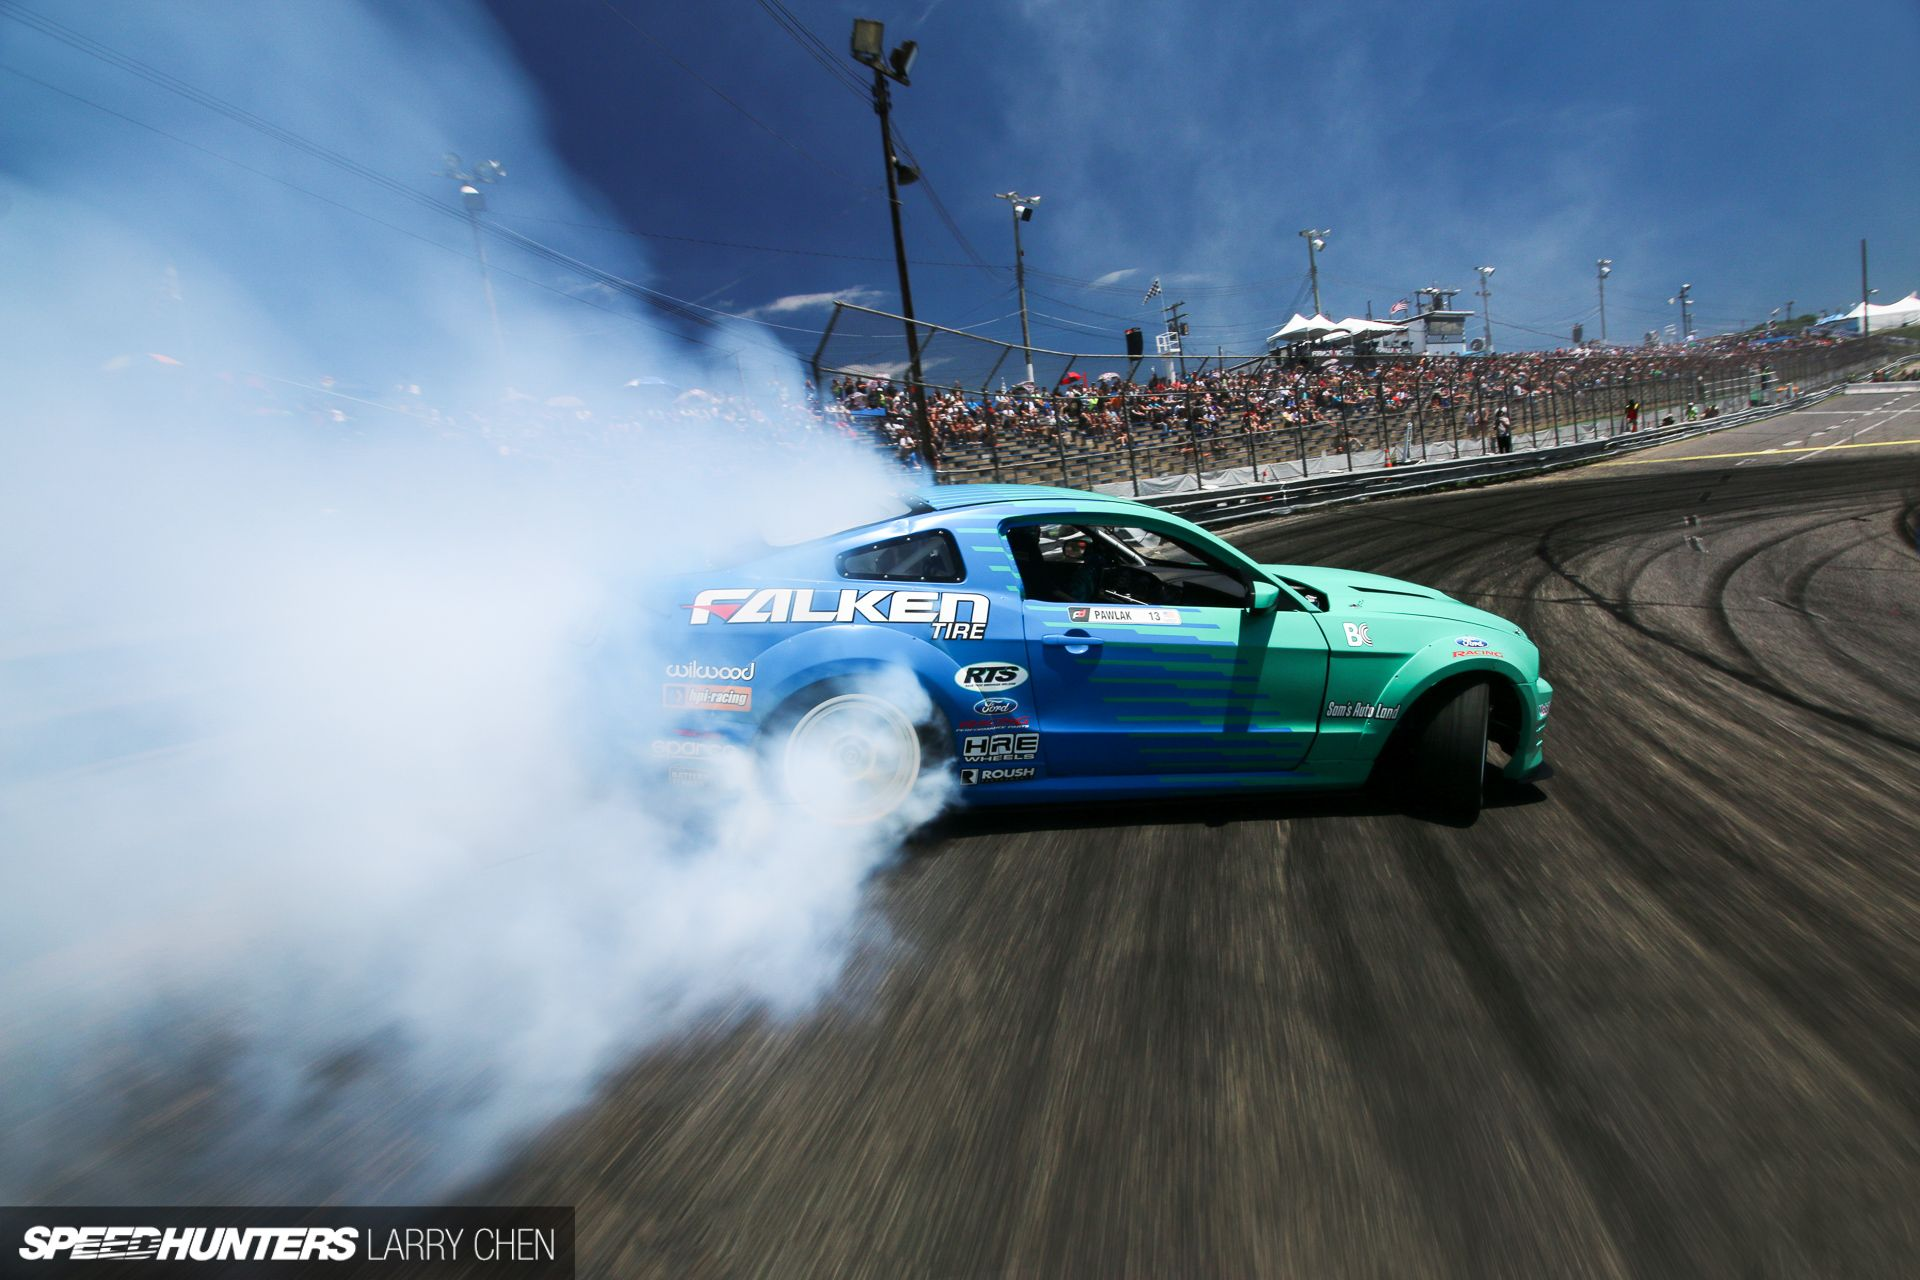 Larry Chen Speedhunters Formula Drift Nj 5 Jpg 1 920 215 1 280